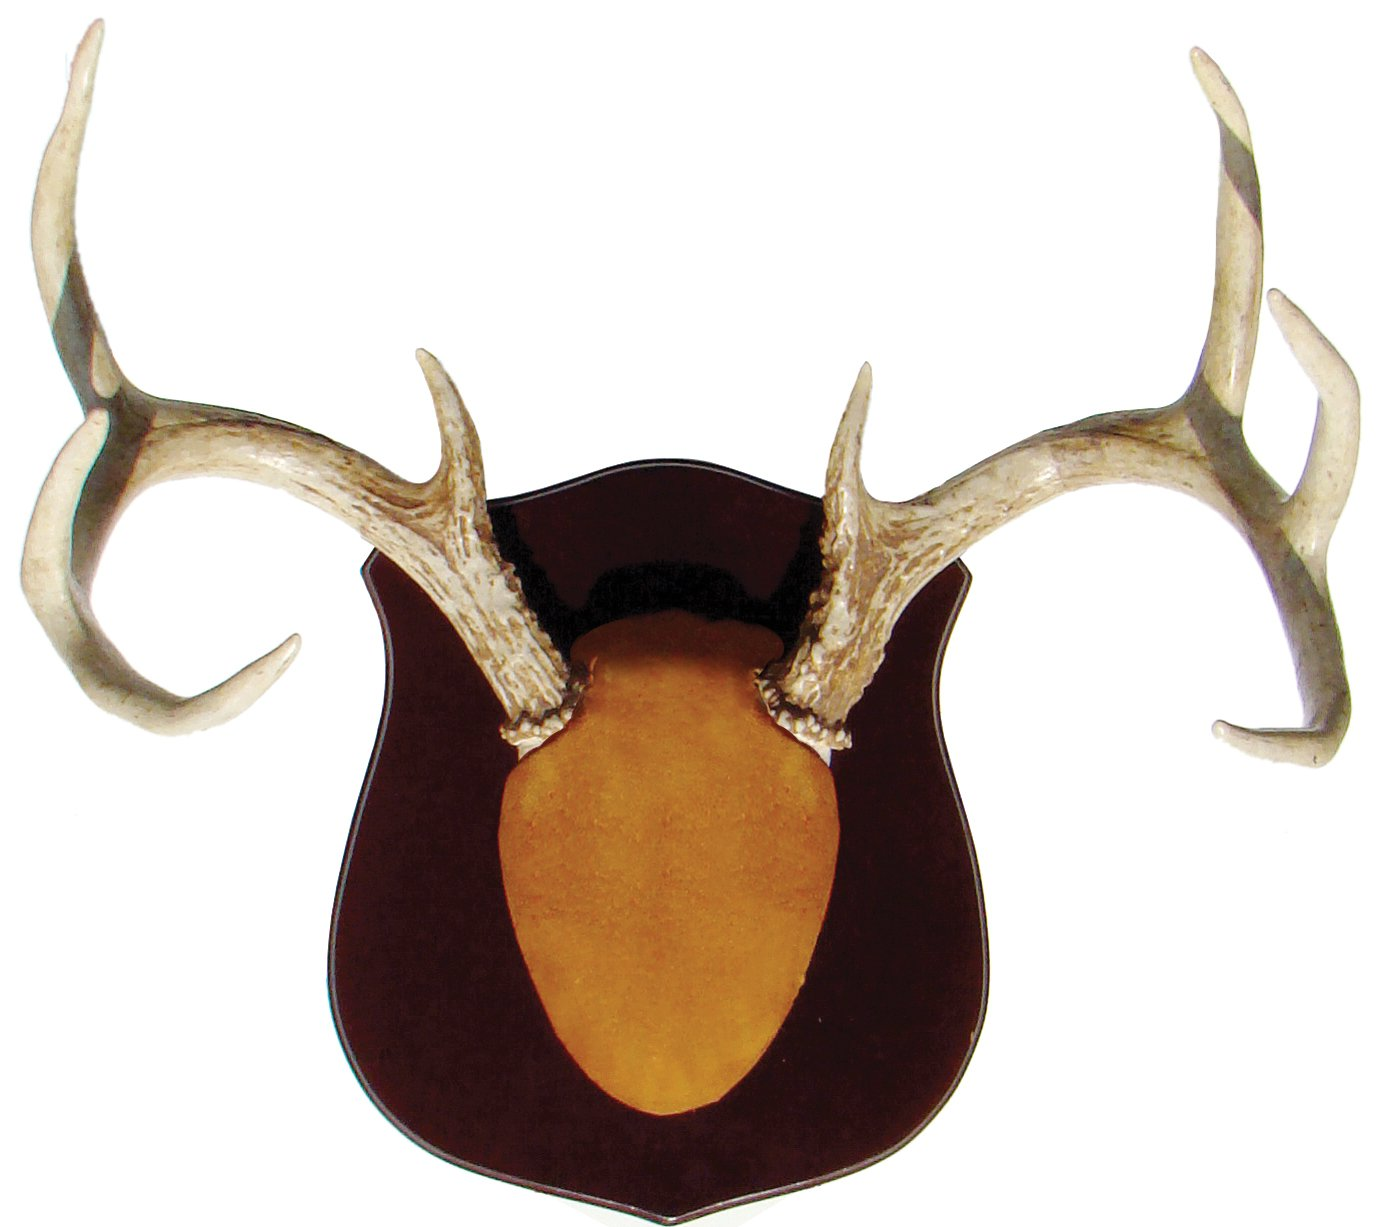 Deer antler mounting kit instructions - Obitt The Ultimate Antler Mounting Kit